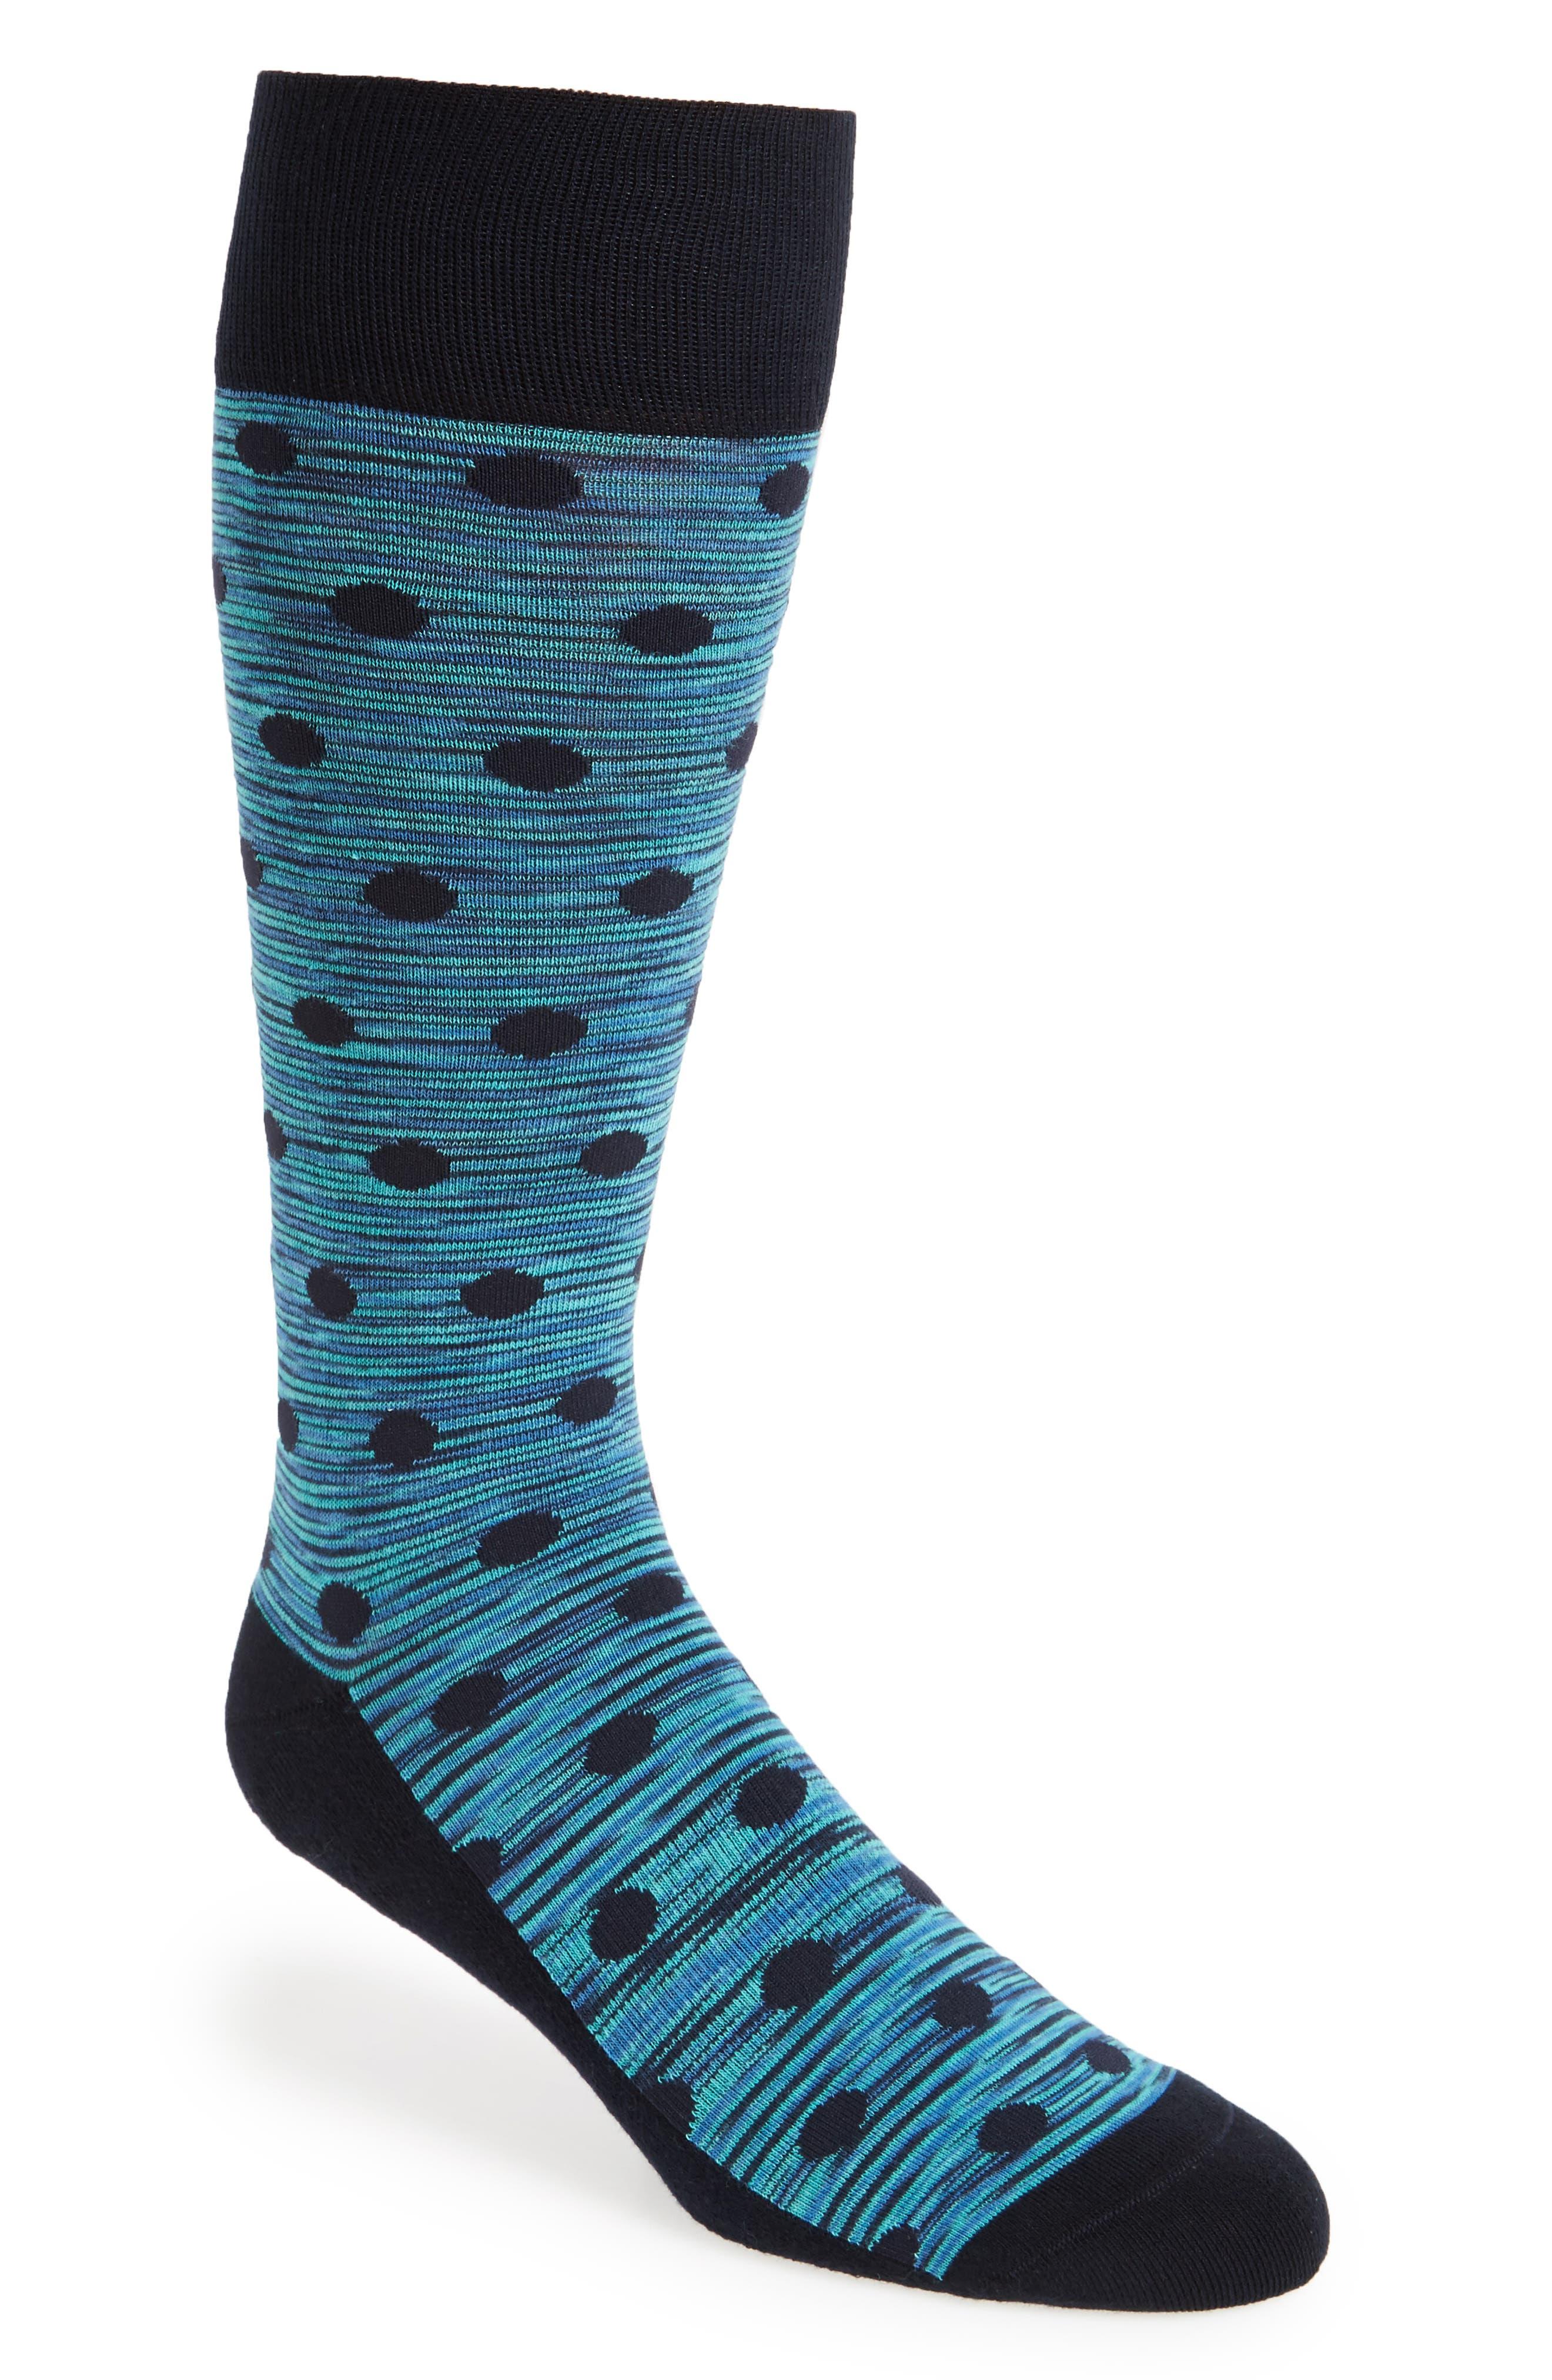 Space Dye Dot Socks,                             Main thumbnail 1, color,                             Navy/ Teal